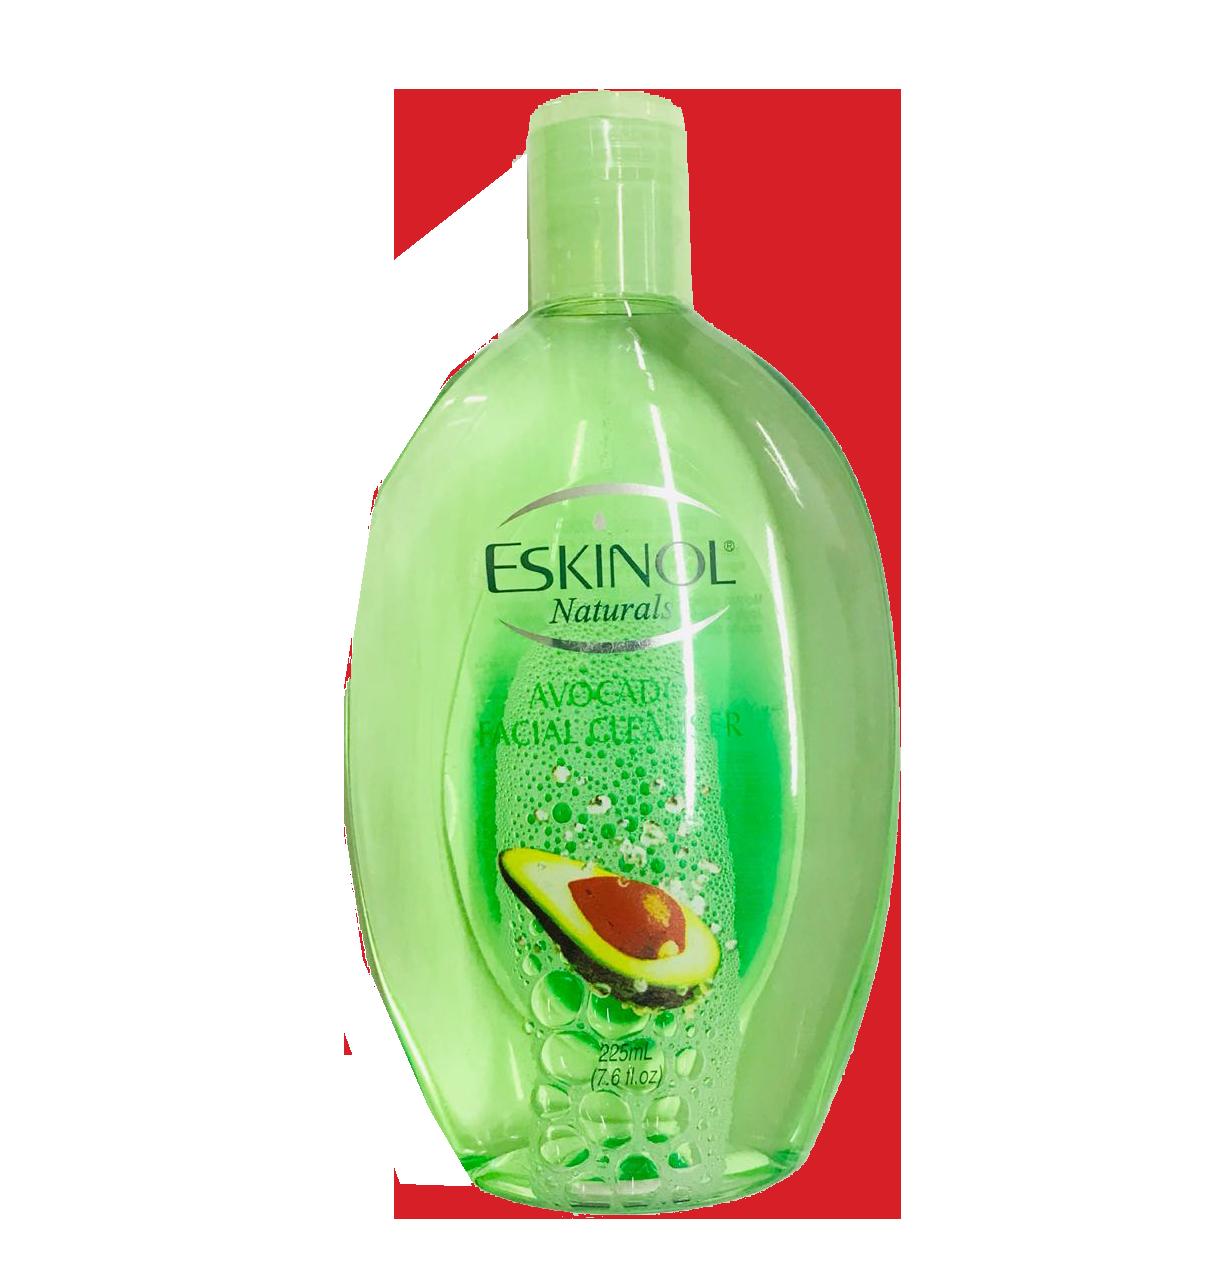 Eskinol Avocado Facial Cleanser 225ml